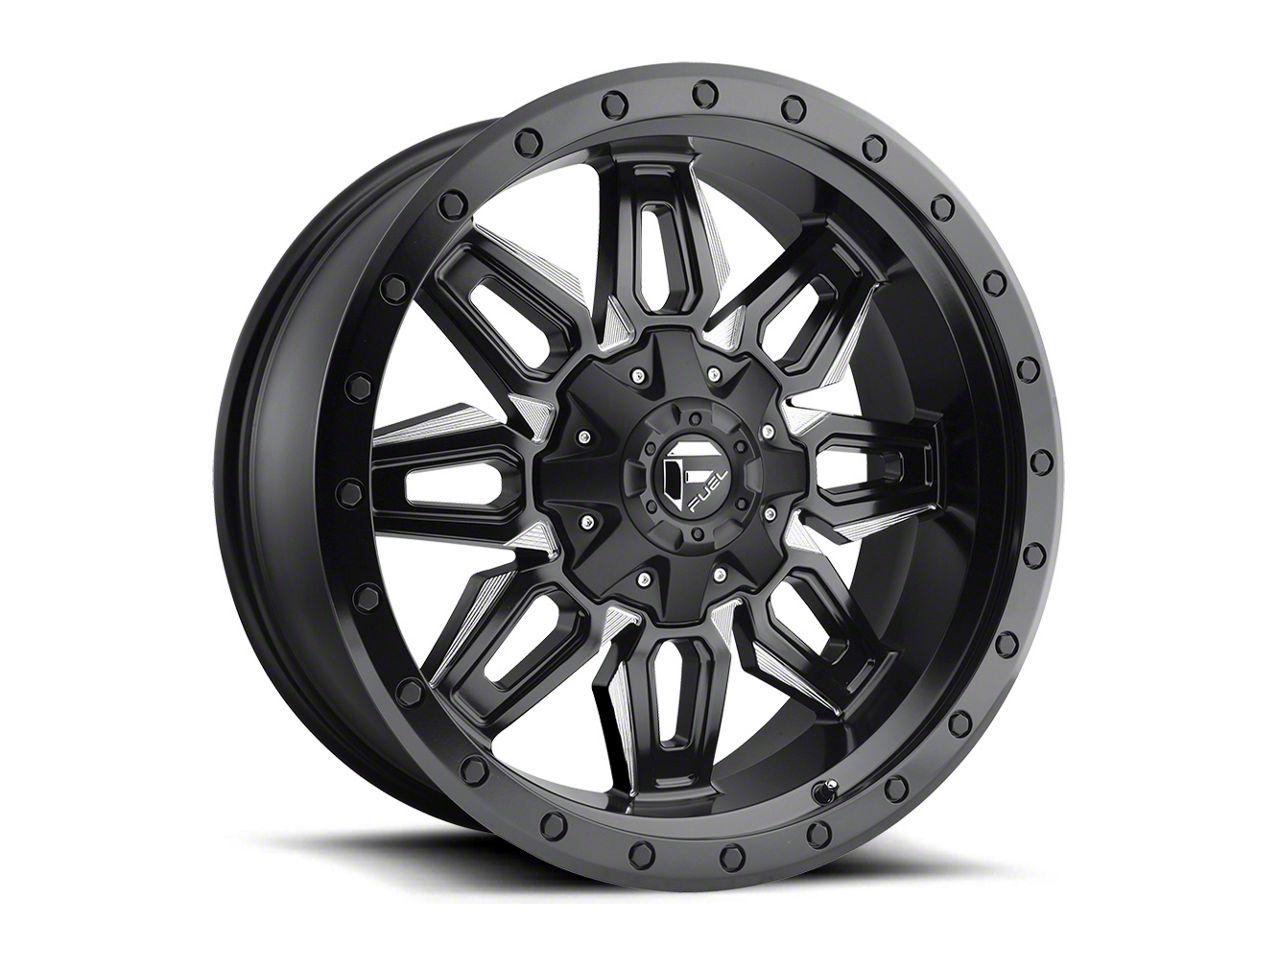 Fuel Wheels Neutron Matte Black Milled 5-Lug Wheel - 20x9 (02-18 RAM 1500, Excluding Mega Cab)